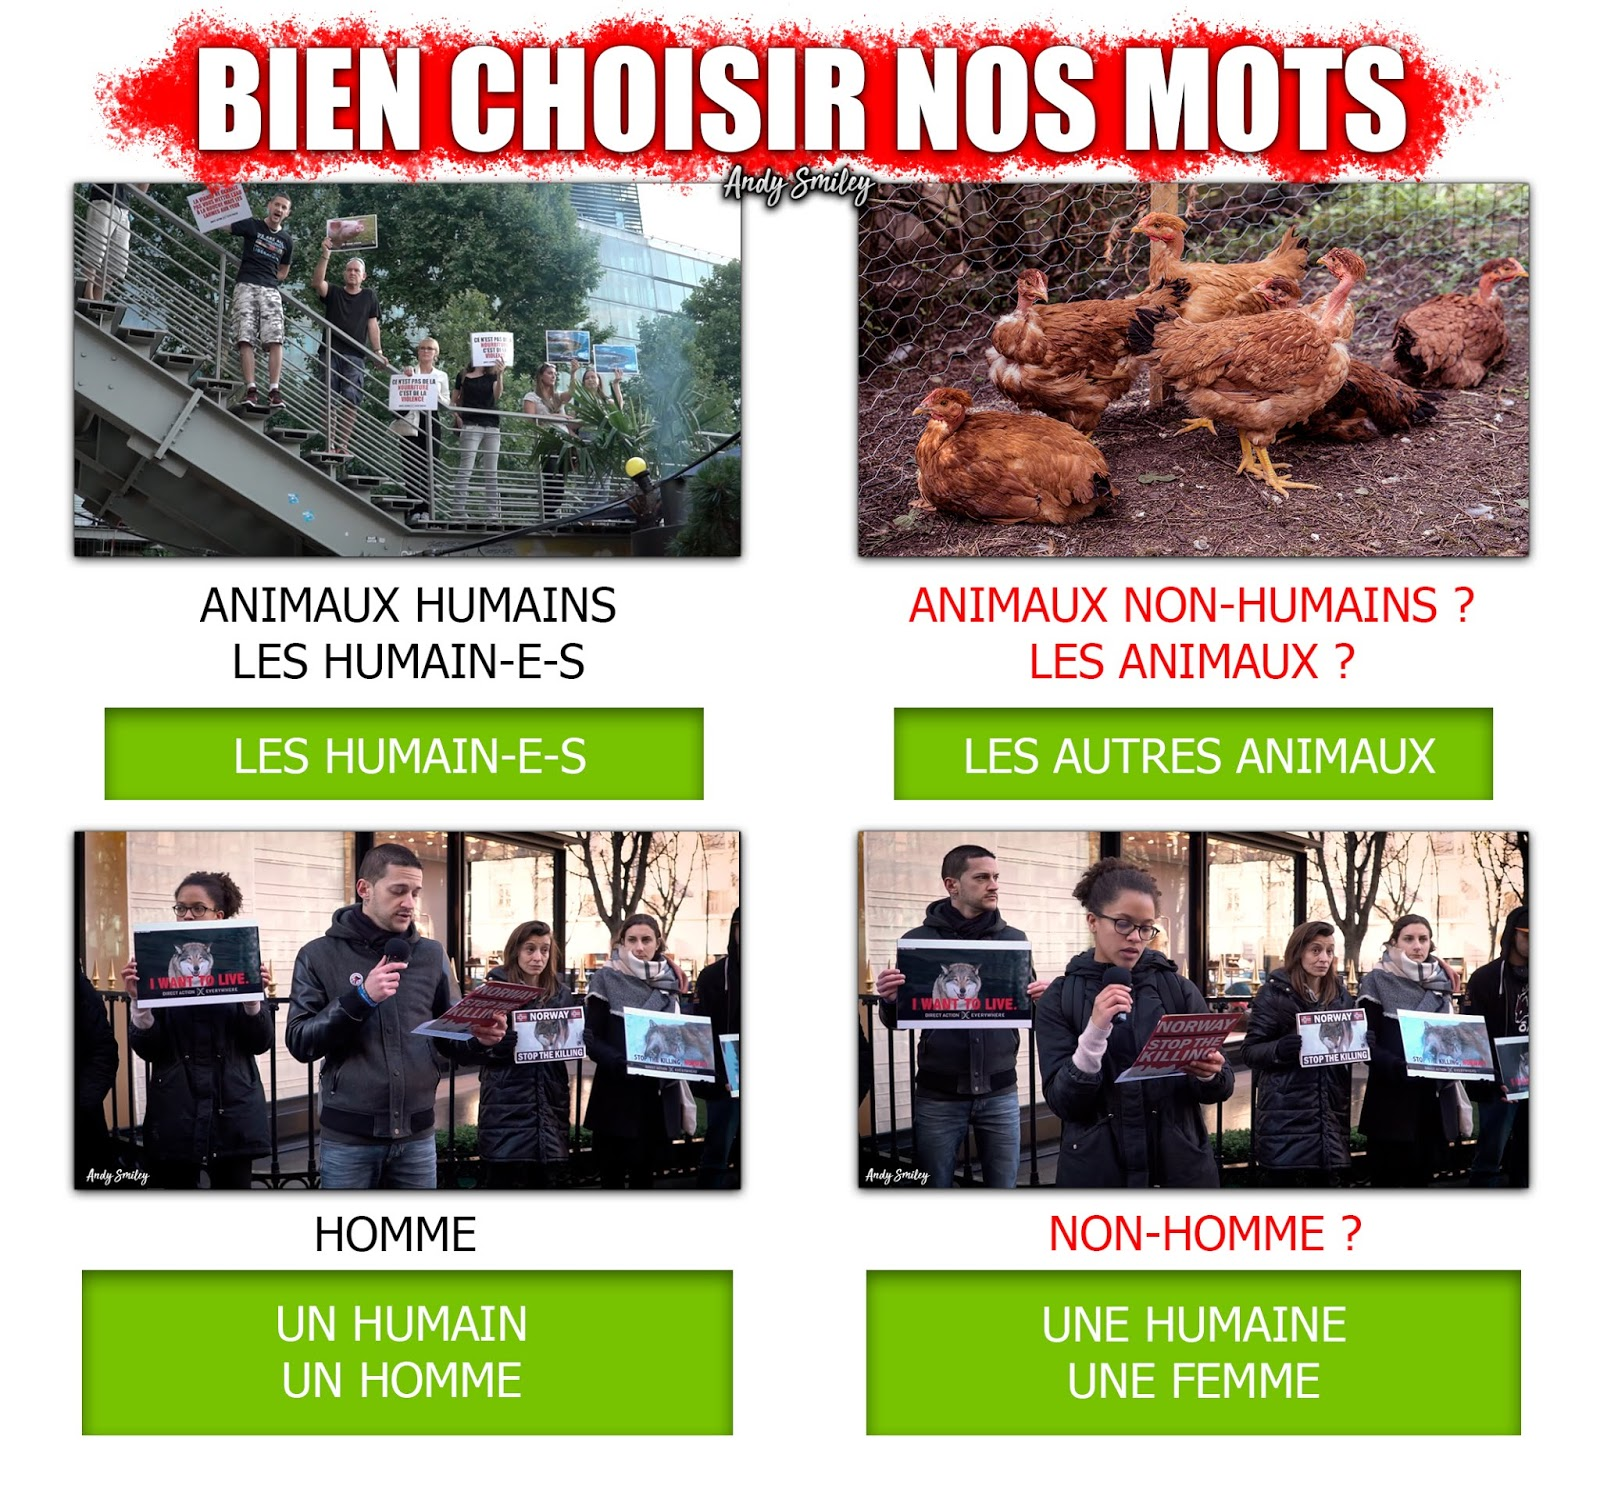 Animaux Non-Humains - Animaux Nonhumains - Les Autres Animaux - Les Animaux